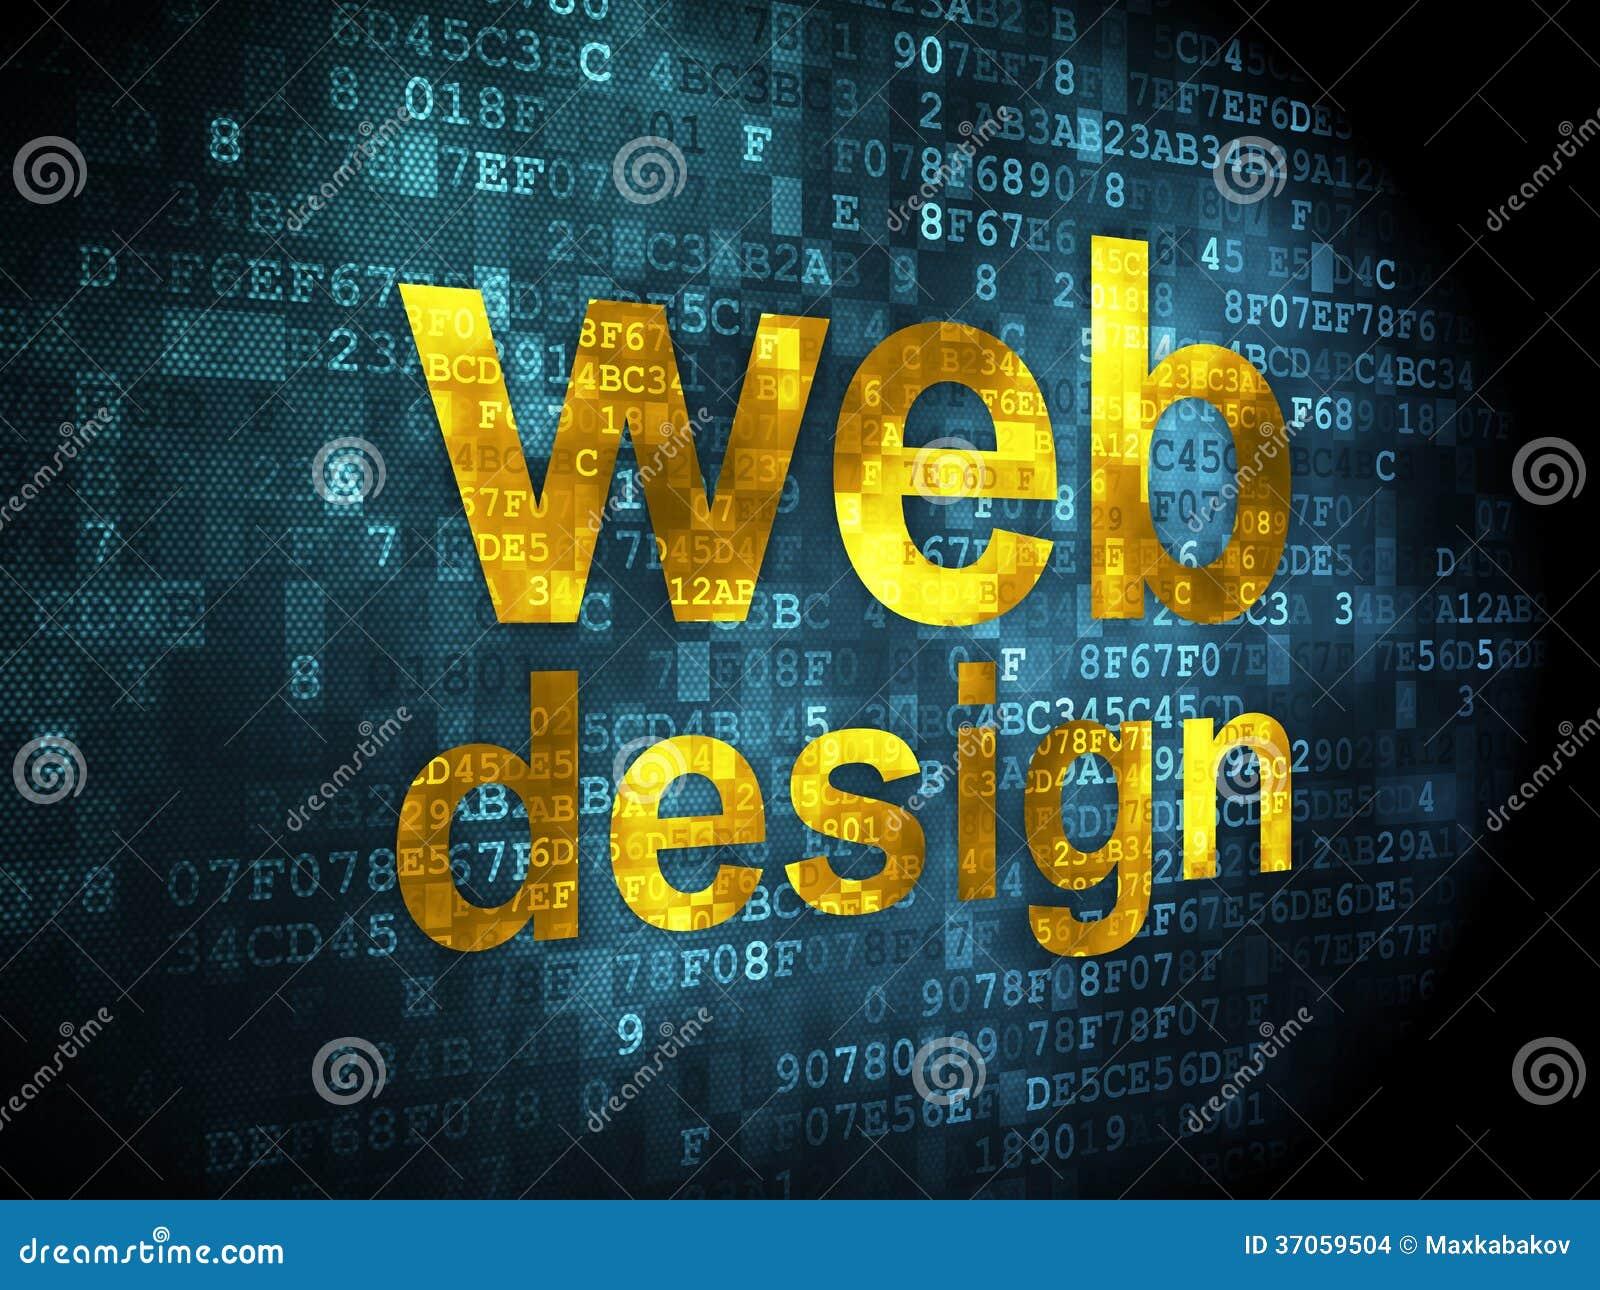 SEO Web Development Concept: Web Design On Digital Stock Images ...